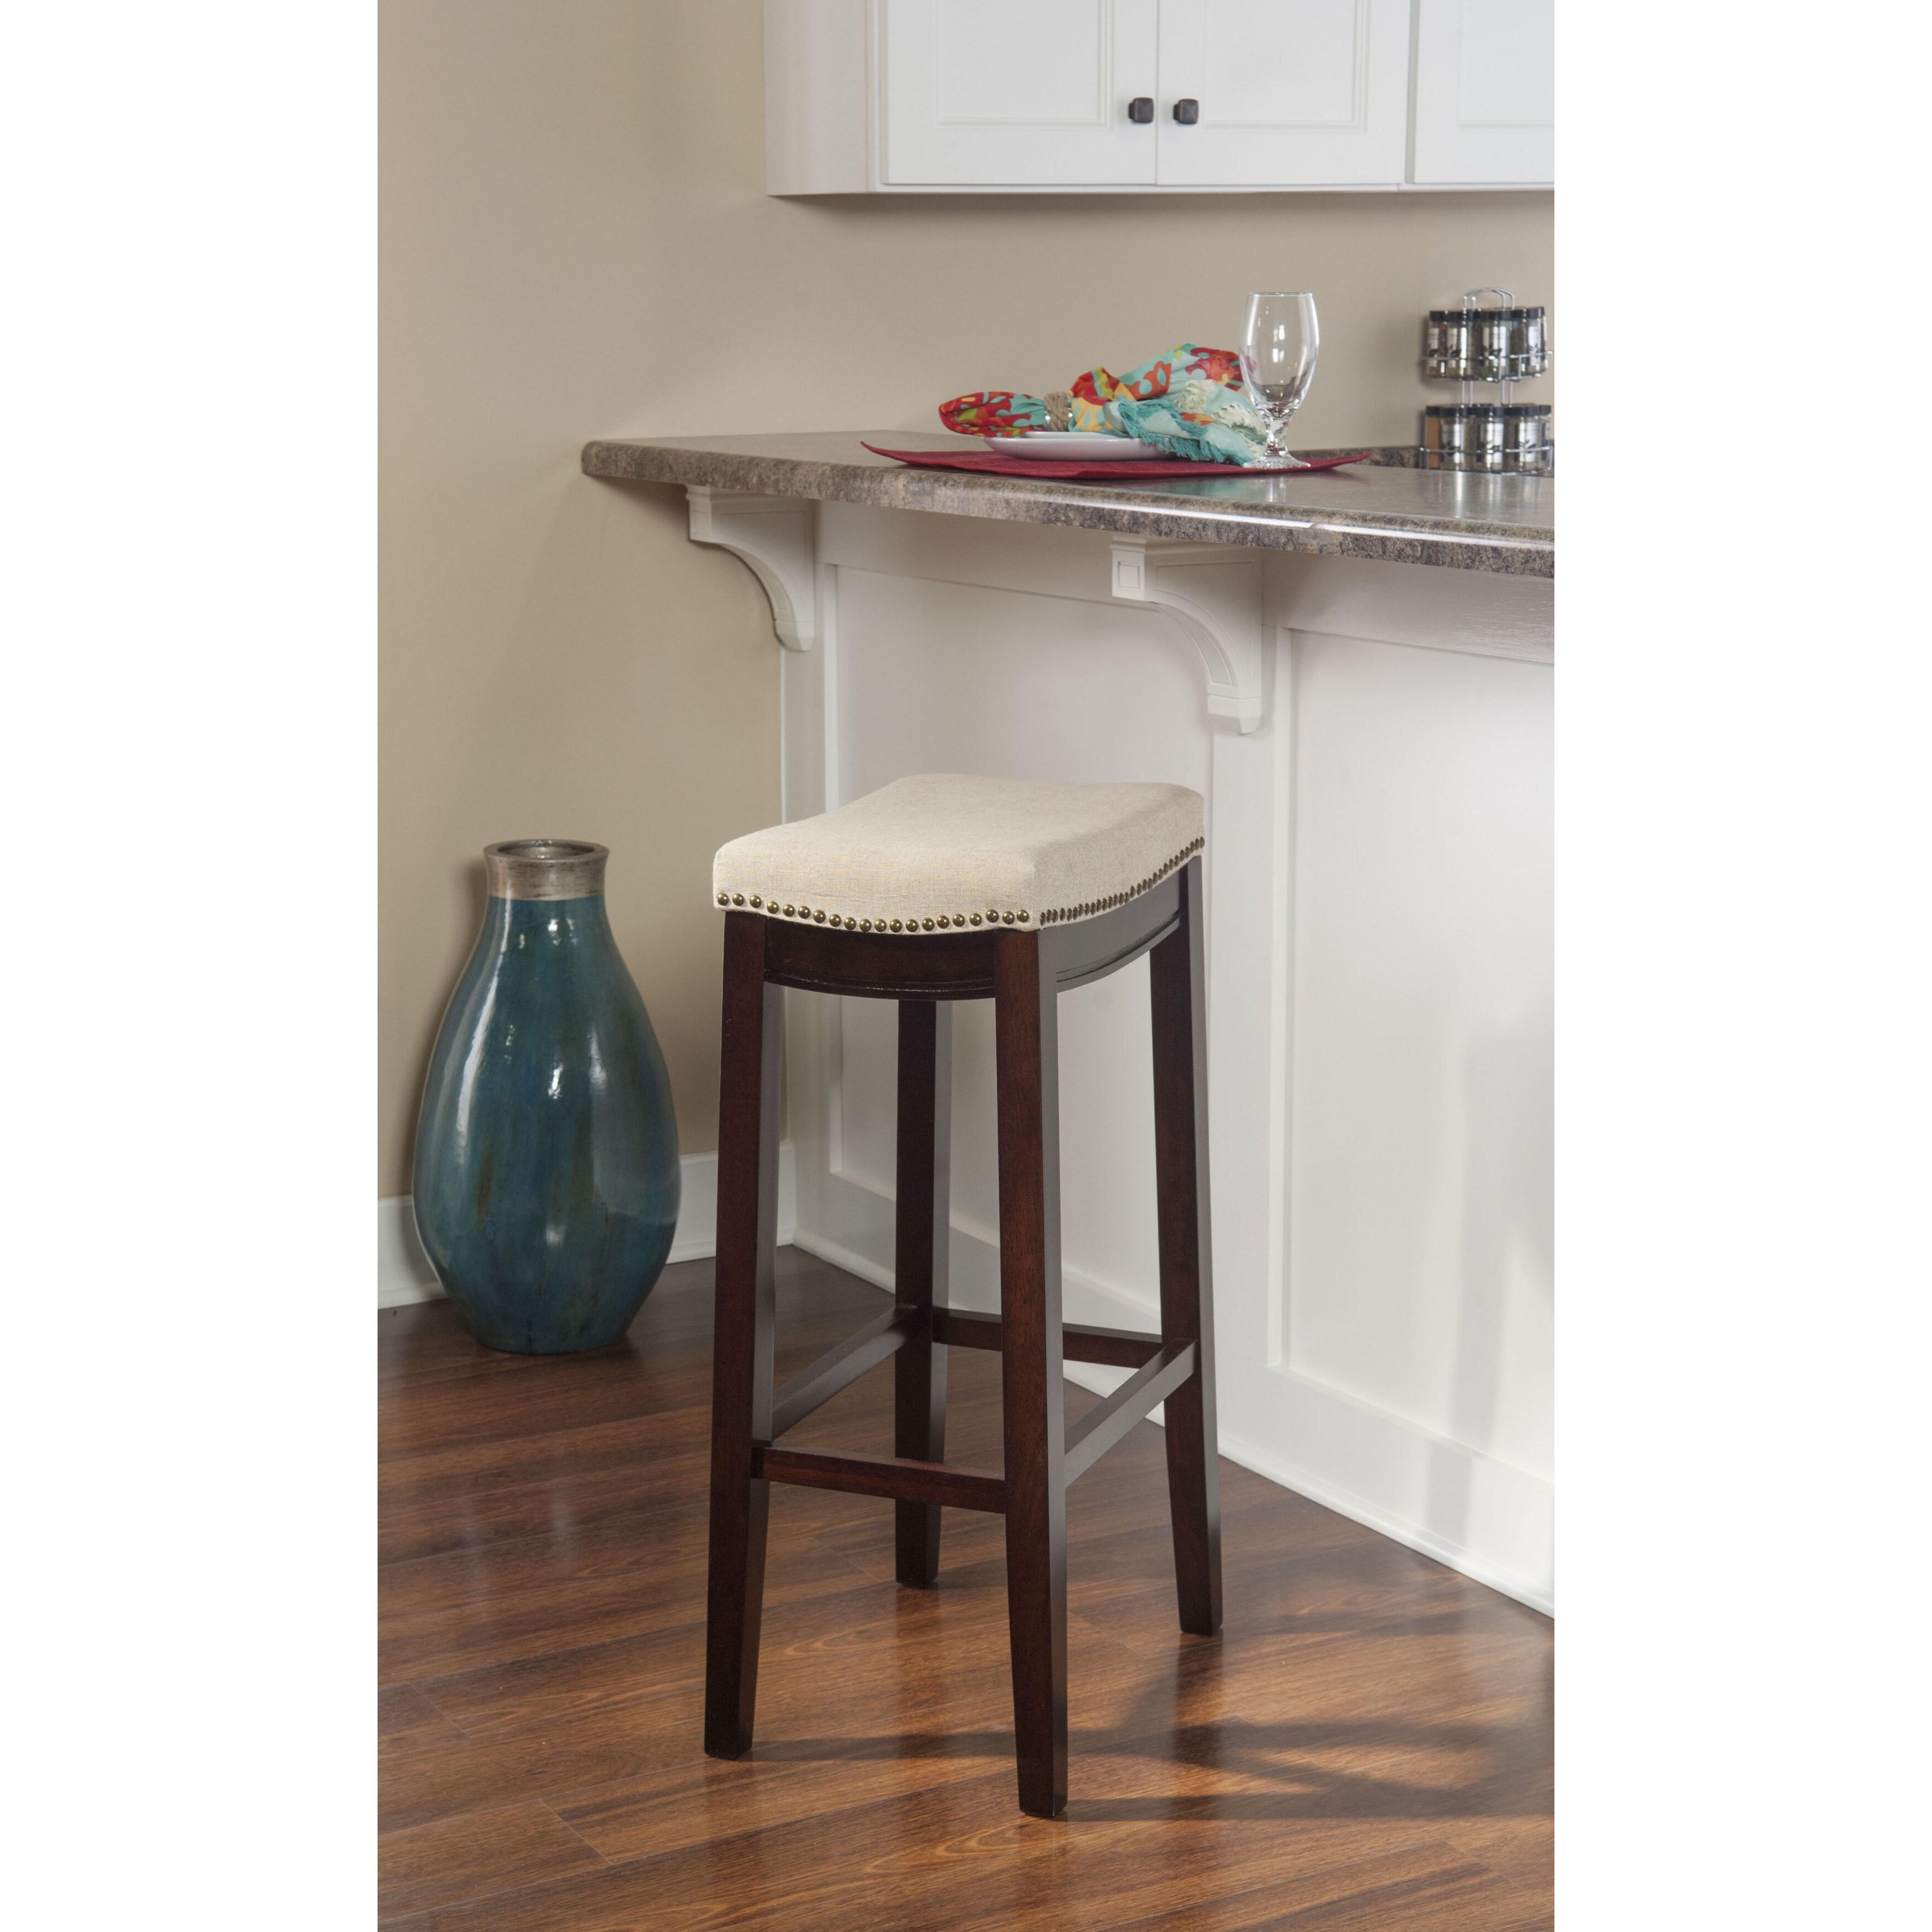 Peachy Linon Bridgeport Bar Stool Jute Unemploymentrelief Wooden Chair Designs For Living Room Unemploymentrelieforg